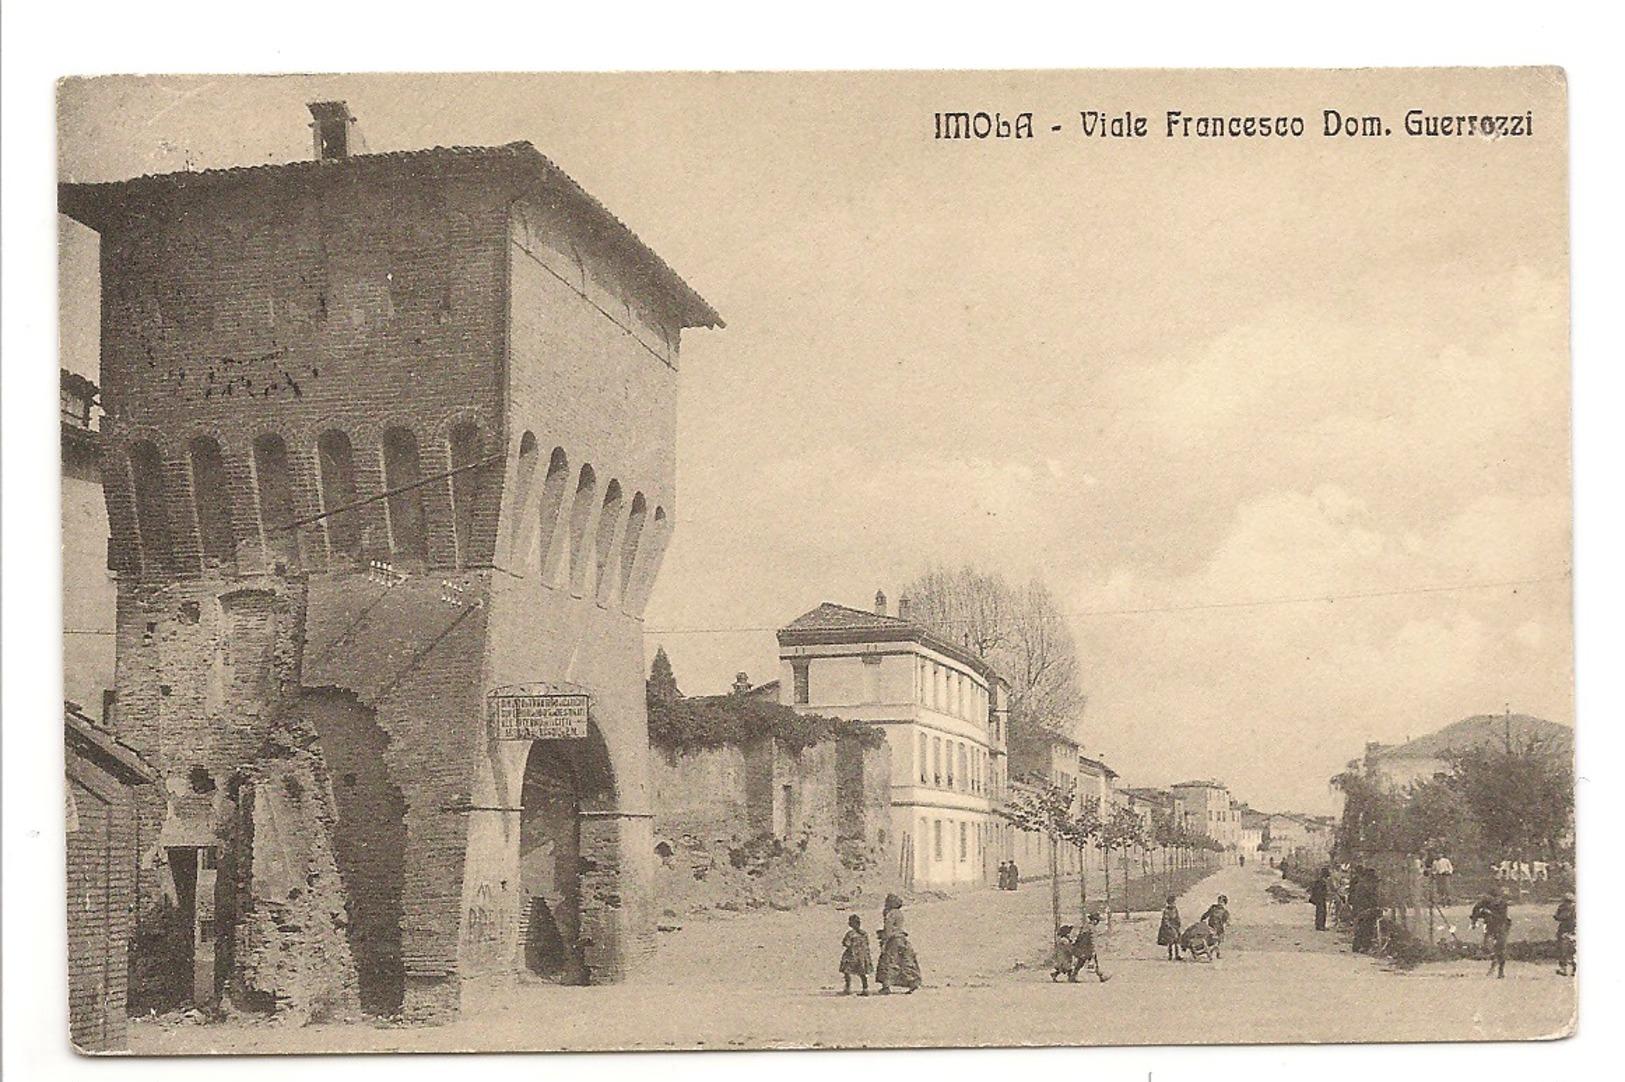 IMOLA - VIALE FRANCESCO DOM. GUERRAZZI - Imola